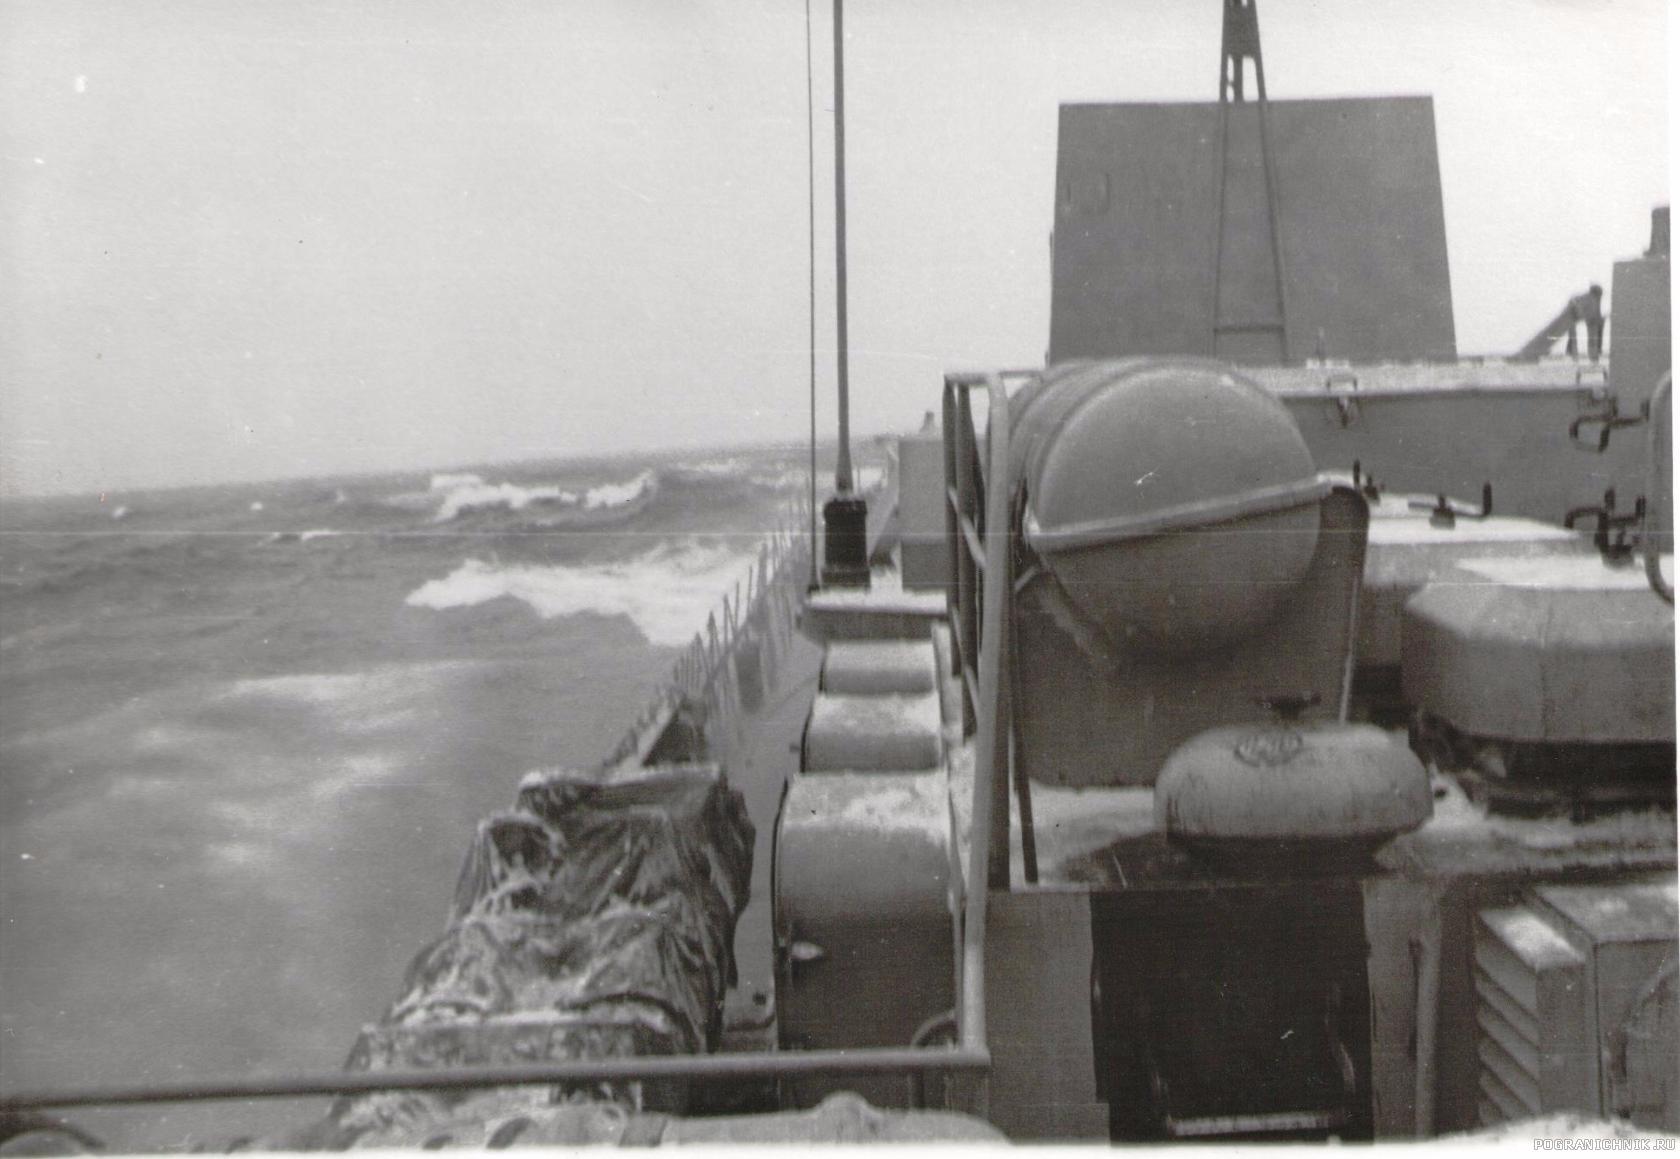 фото из архива Николая Скачкова